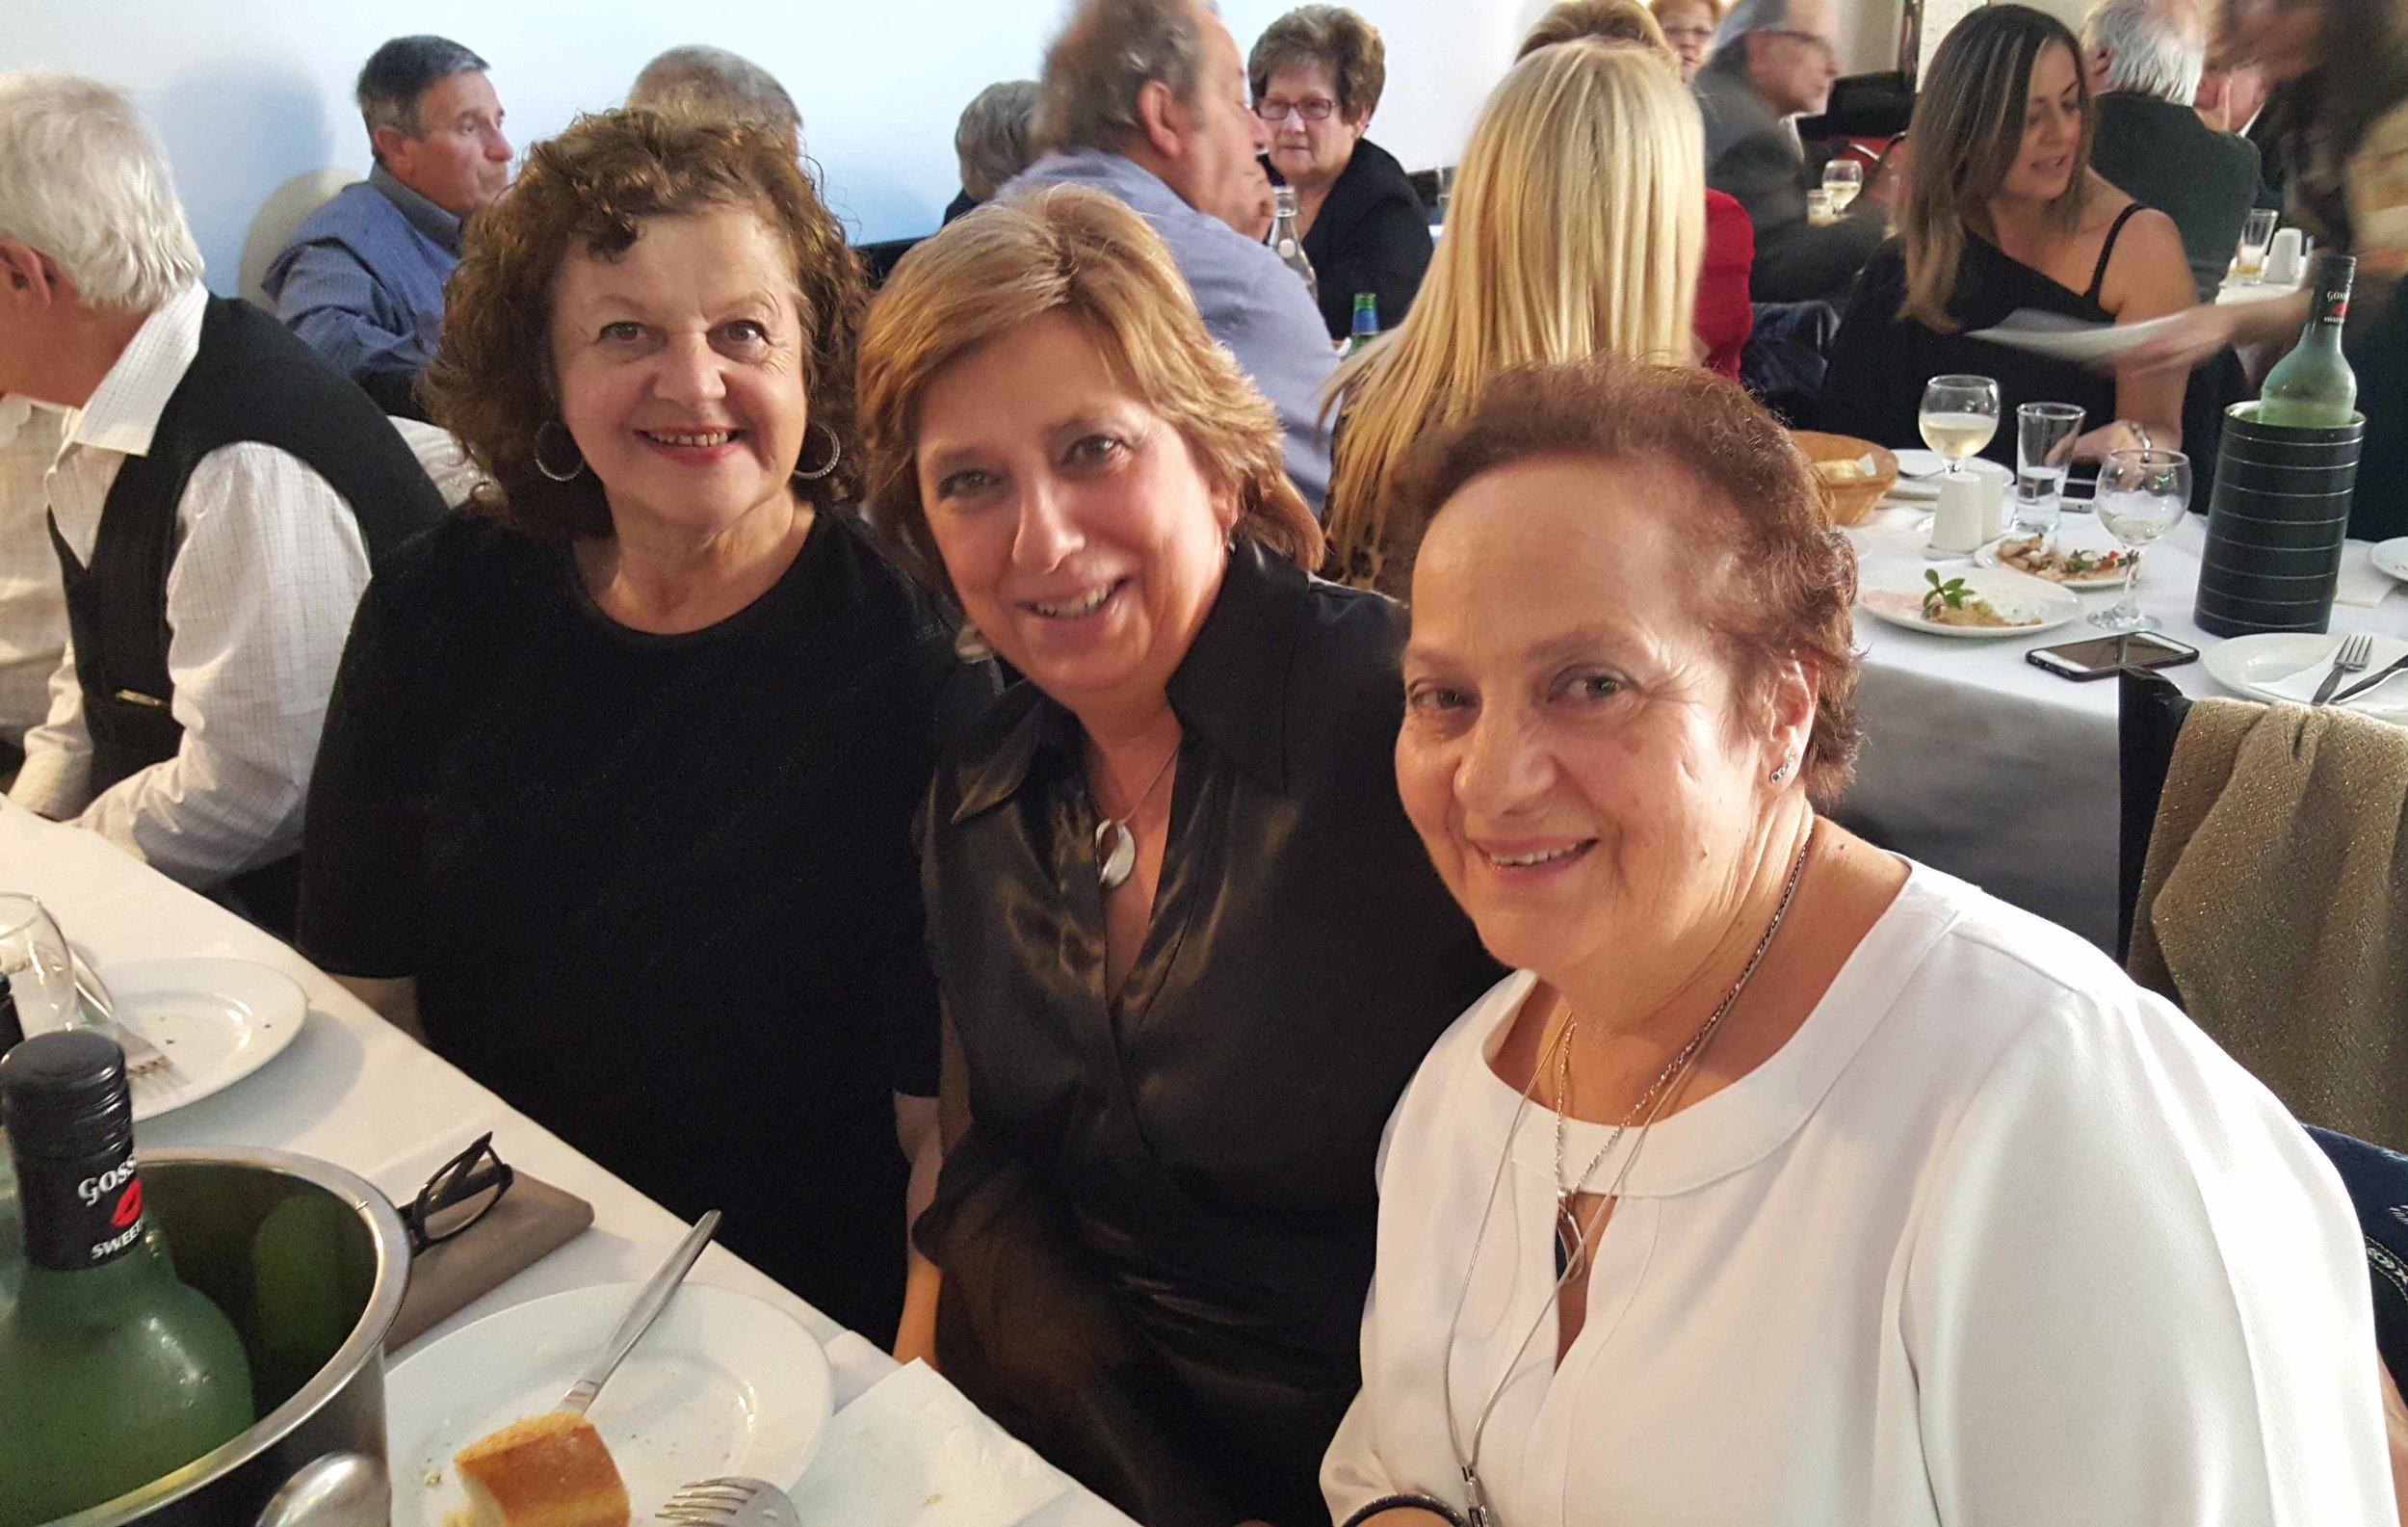 Helen Valsamis, Frances Vayanos and Helen Trifonopoulos. Χρόνια πολλά! Ladies